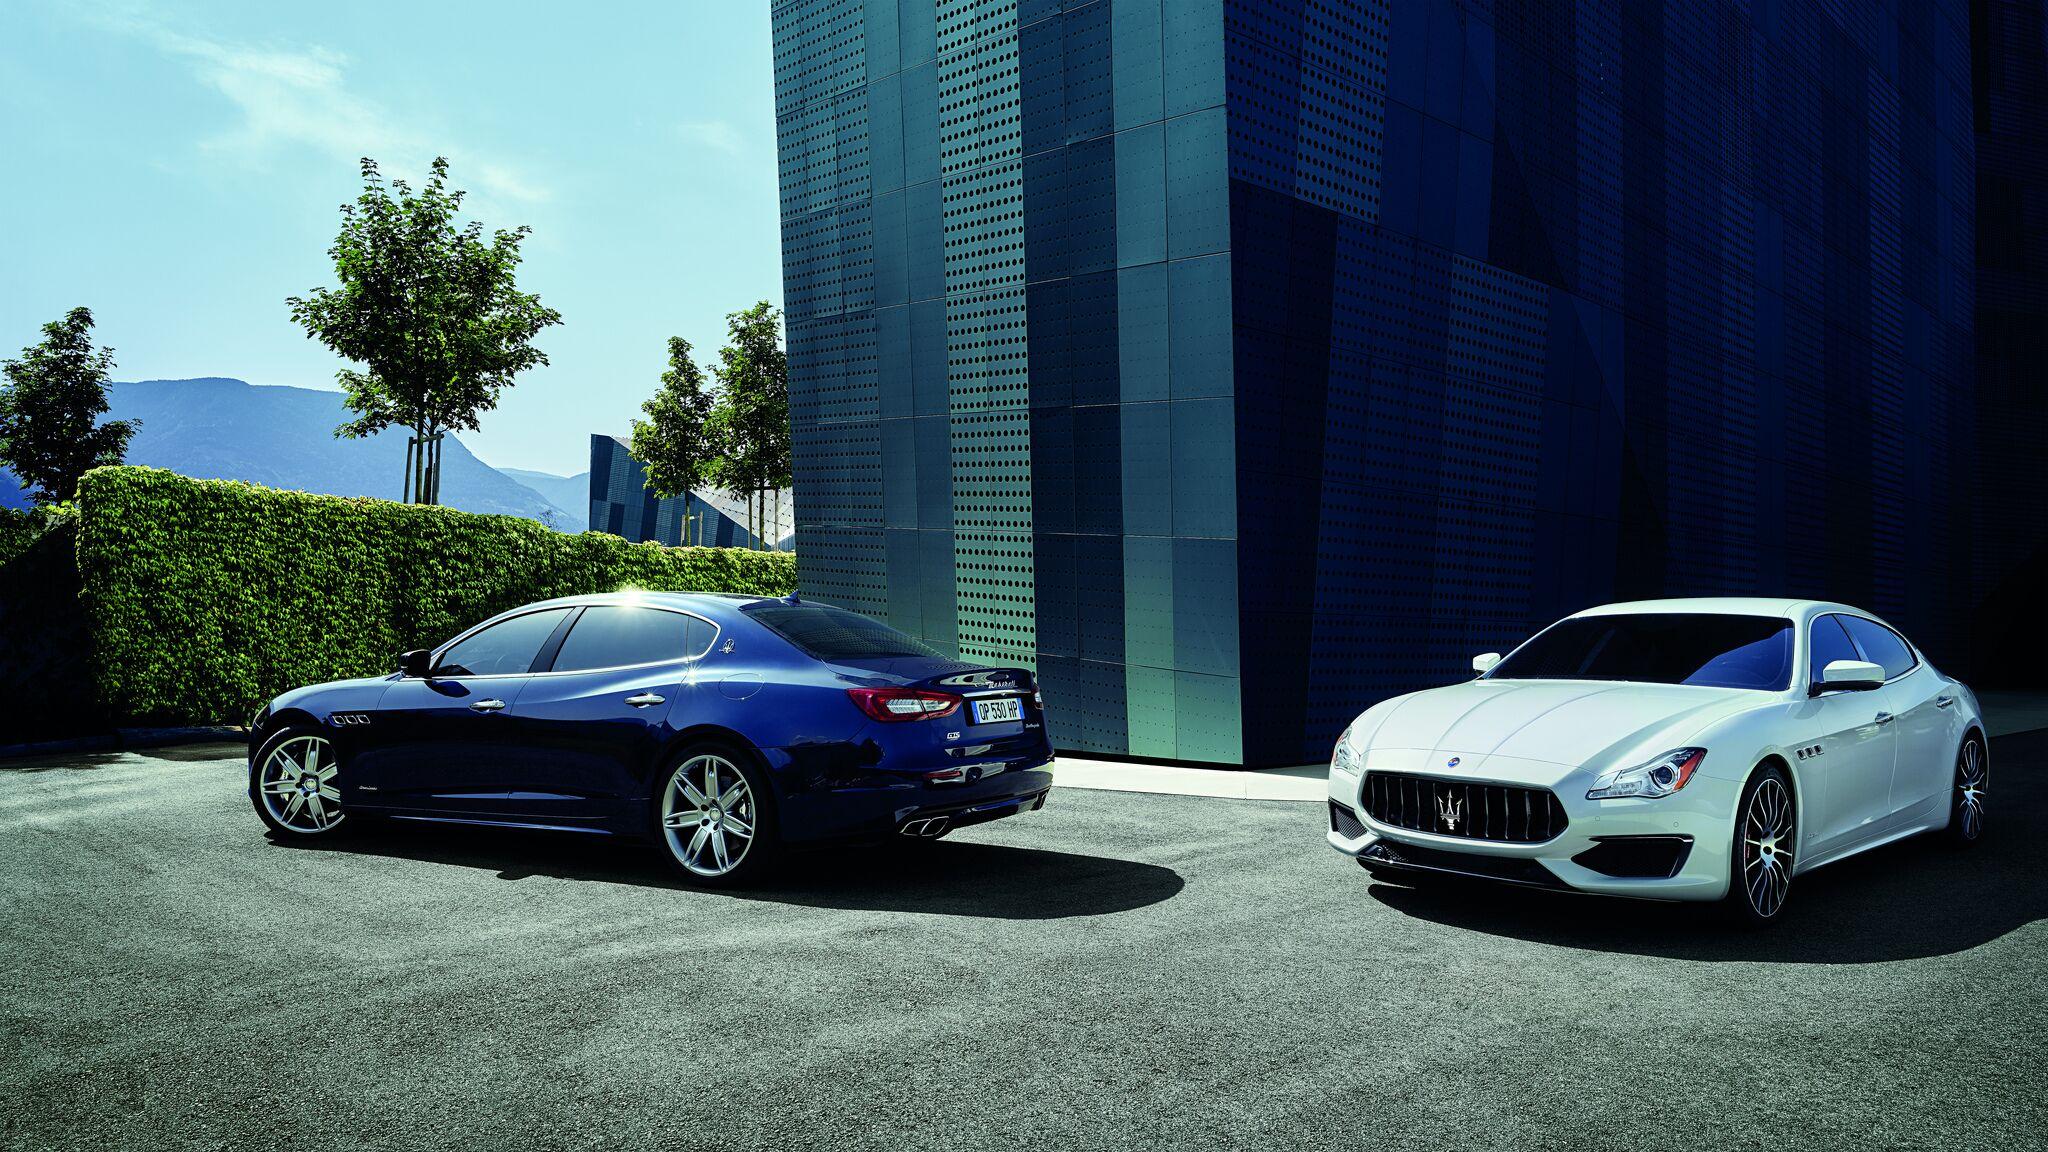 Maserati Quattroporte GranLusso and GranSport | Bert Ogden Maserati | Mission, TX